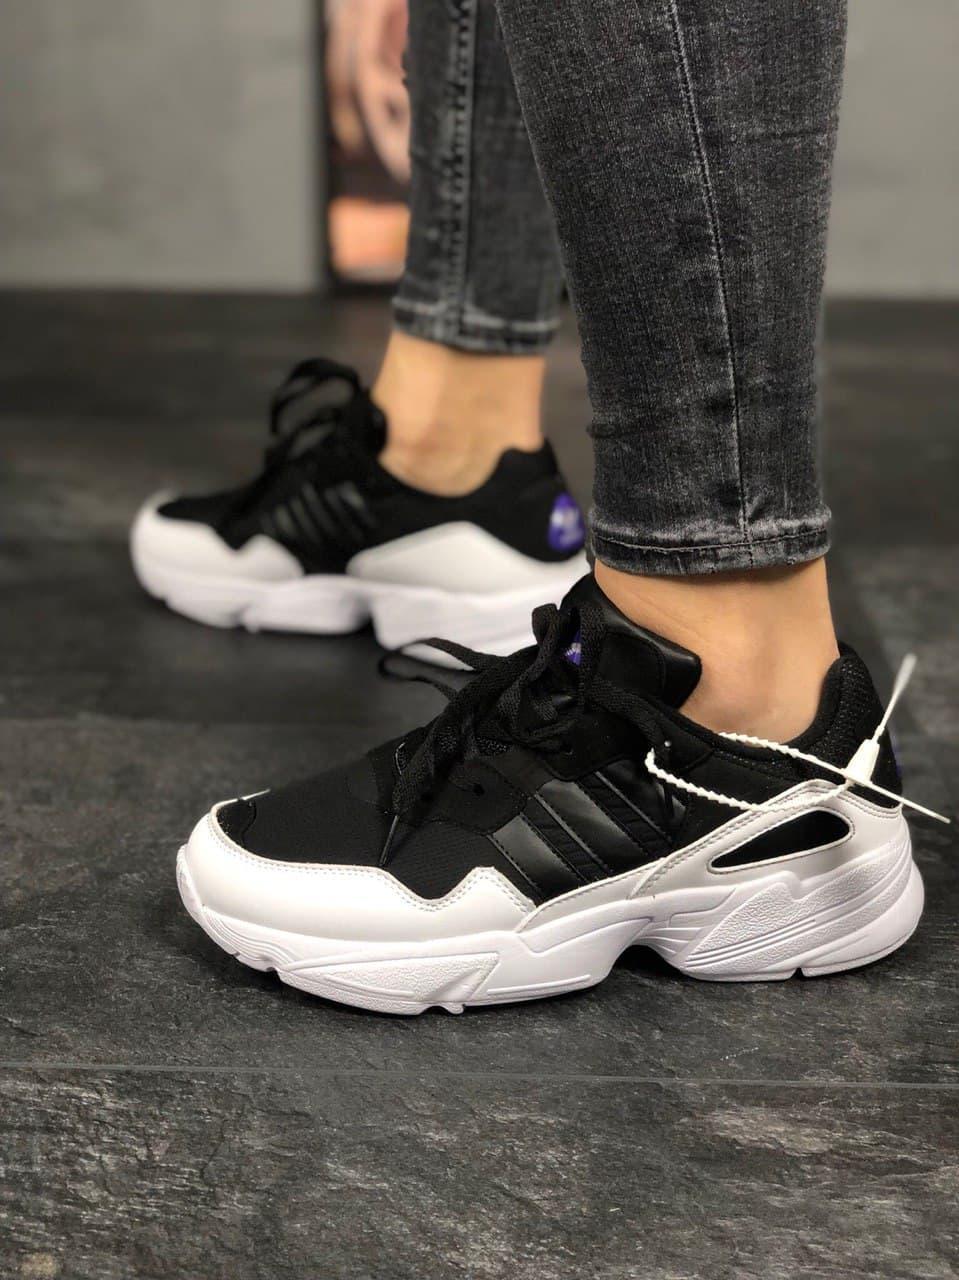 Женские кроссовки Adidas Yung 96 Black White